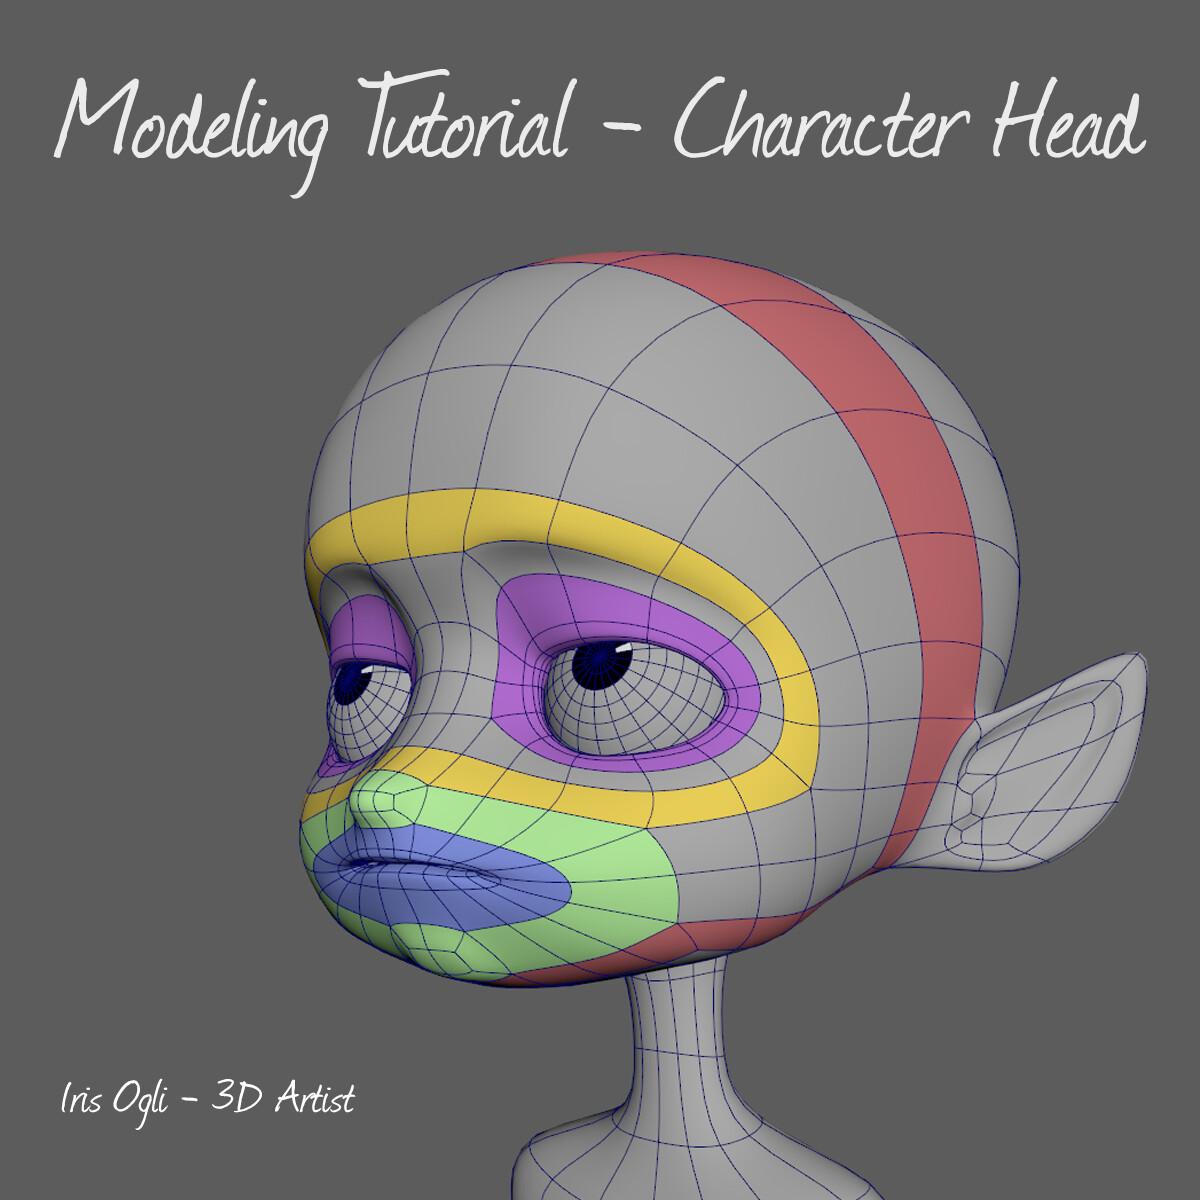 ArtStation - 3D Modeling Tutorial -Modeling Character head